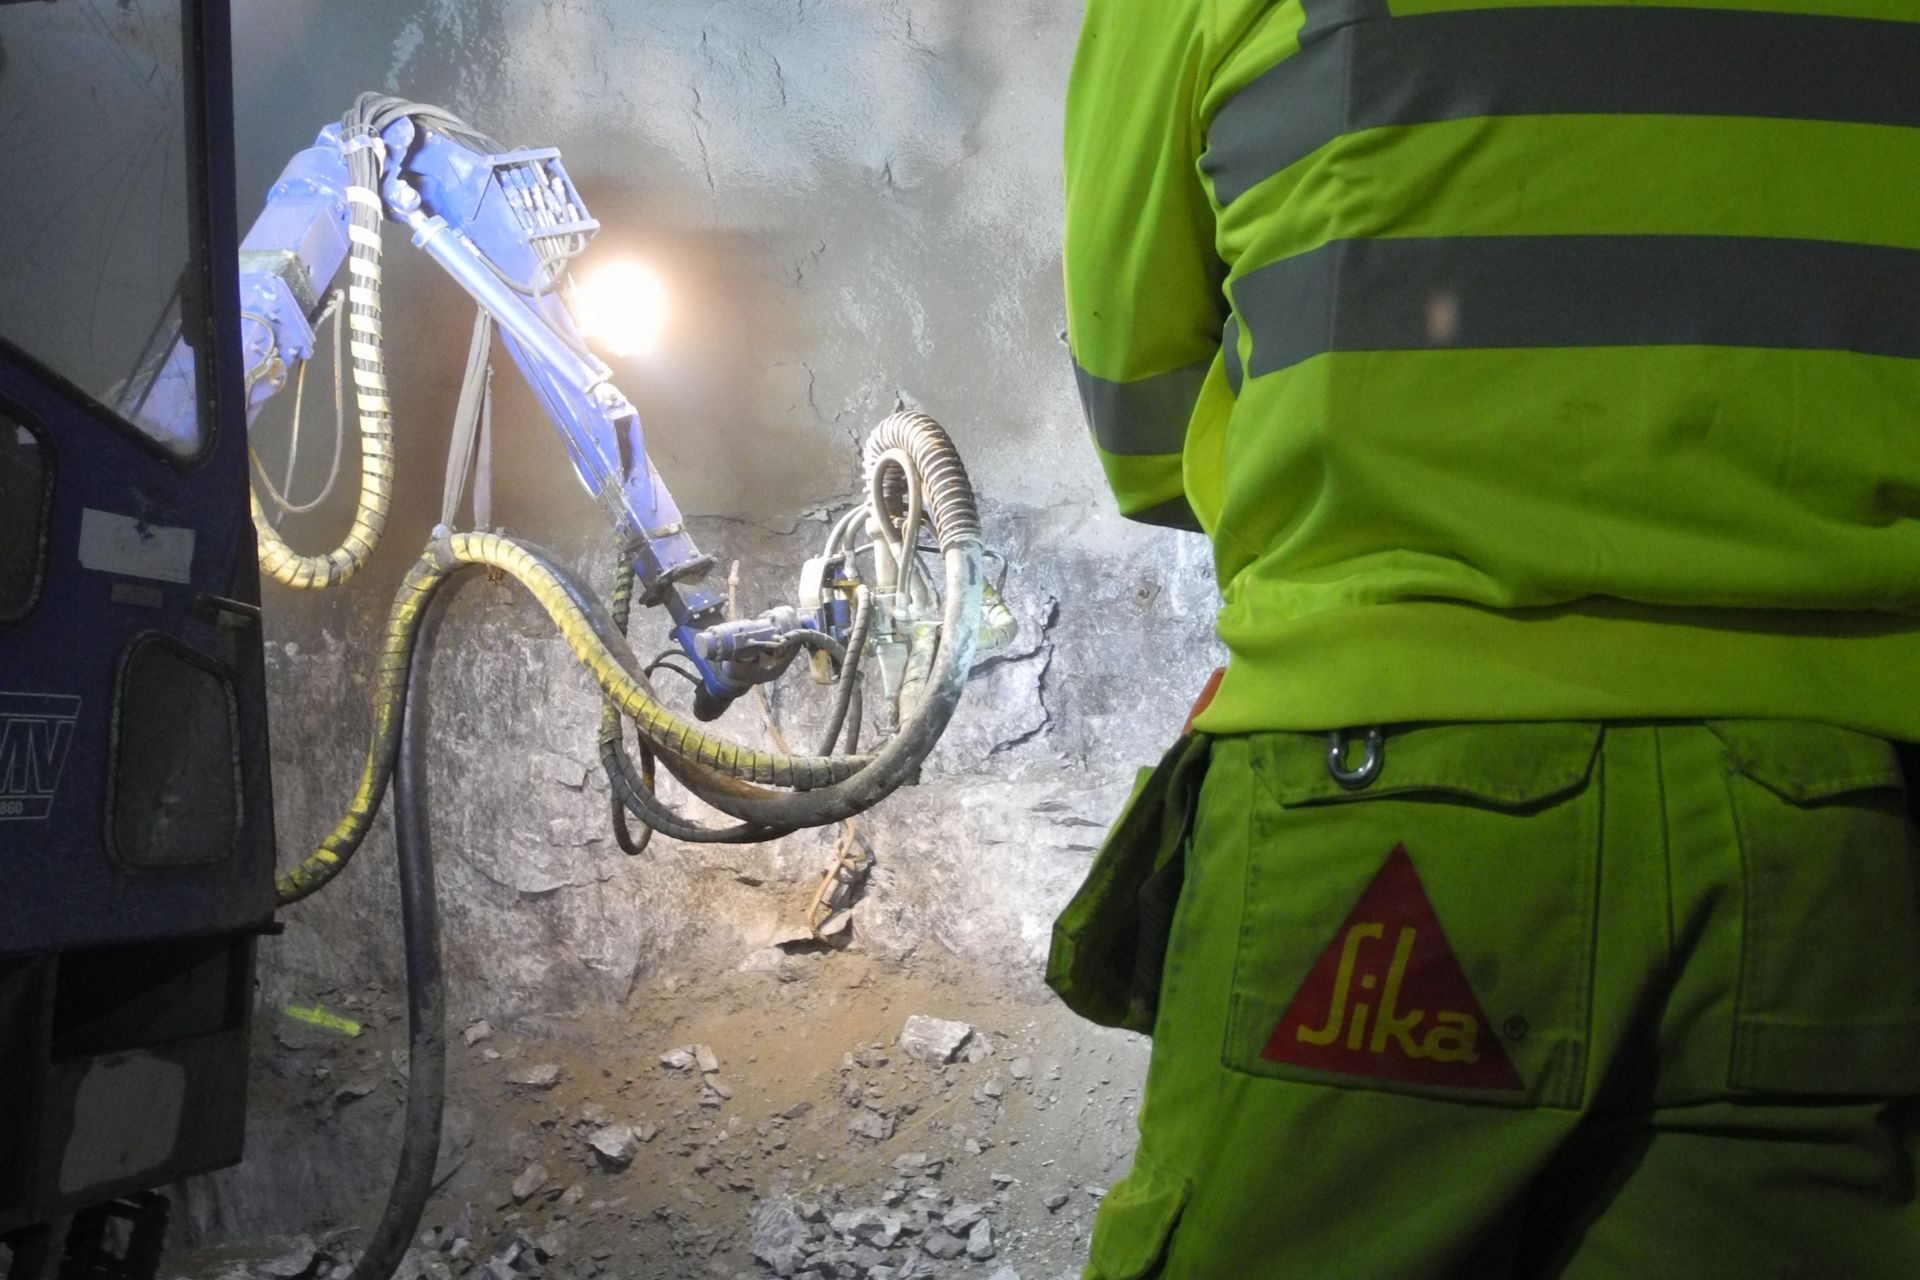 Spraying process underground using mobile piston pump spray units